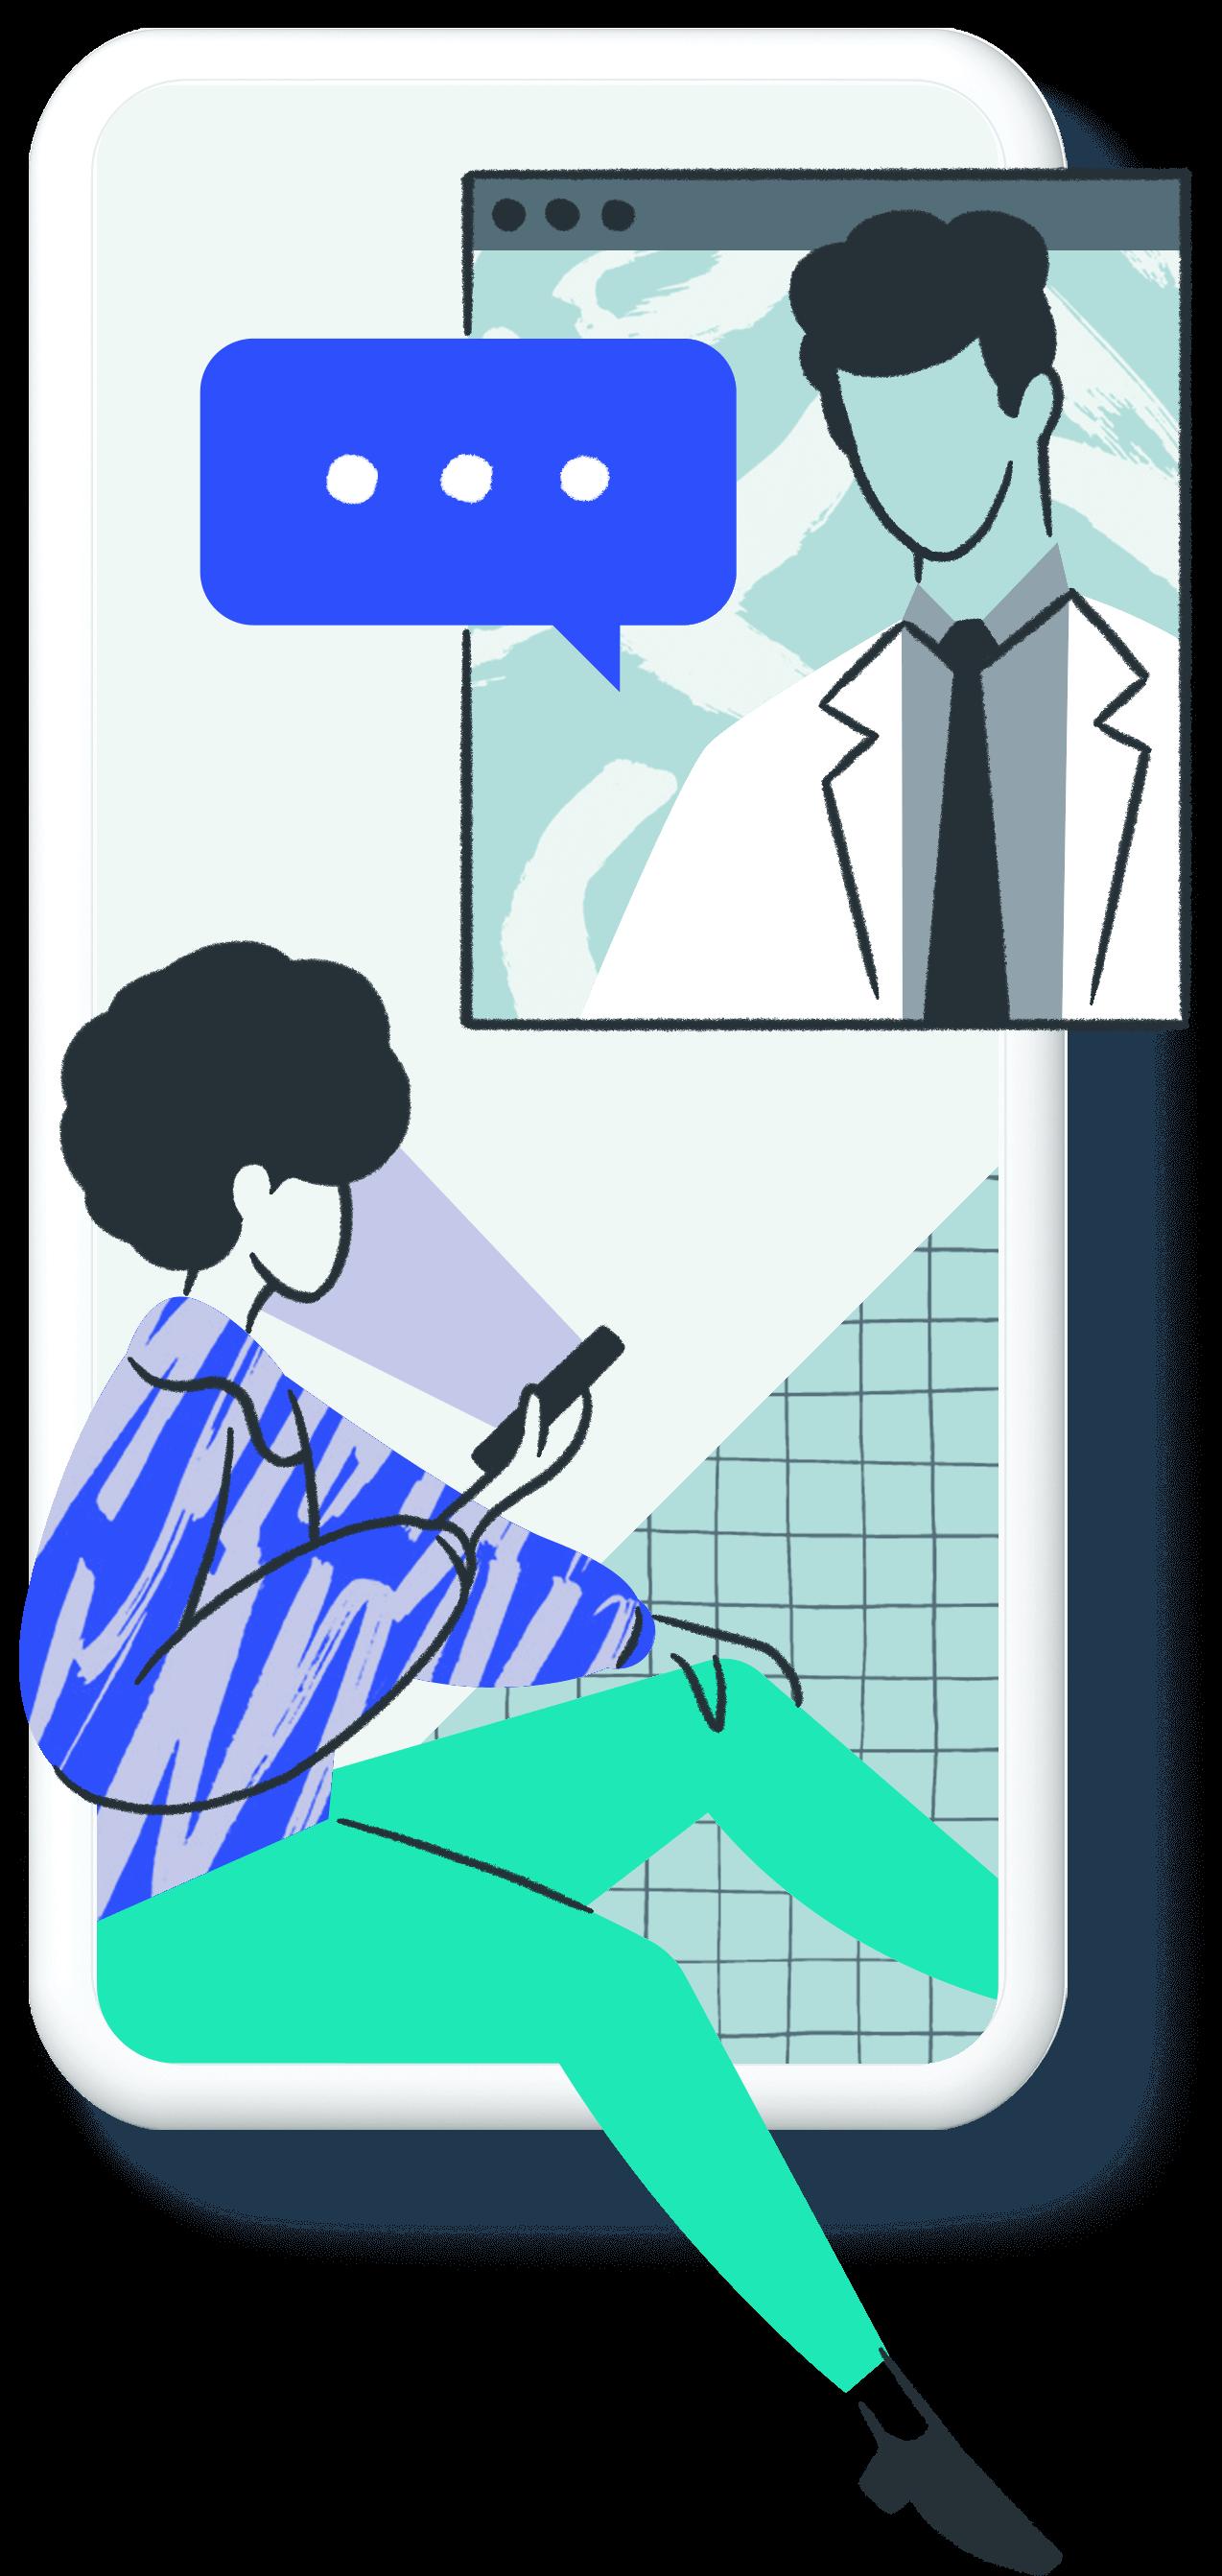 corp-consultation_Illustration-1